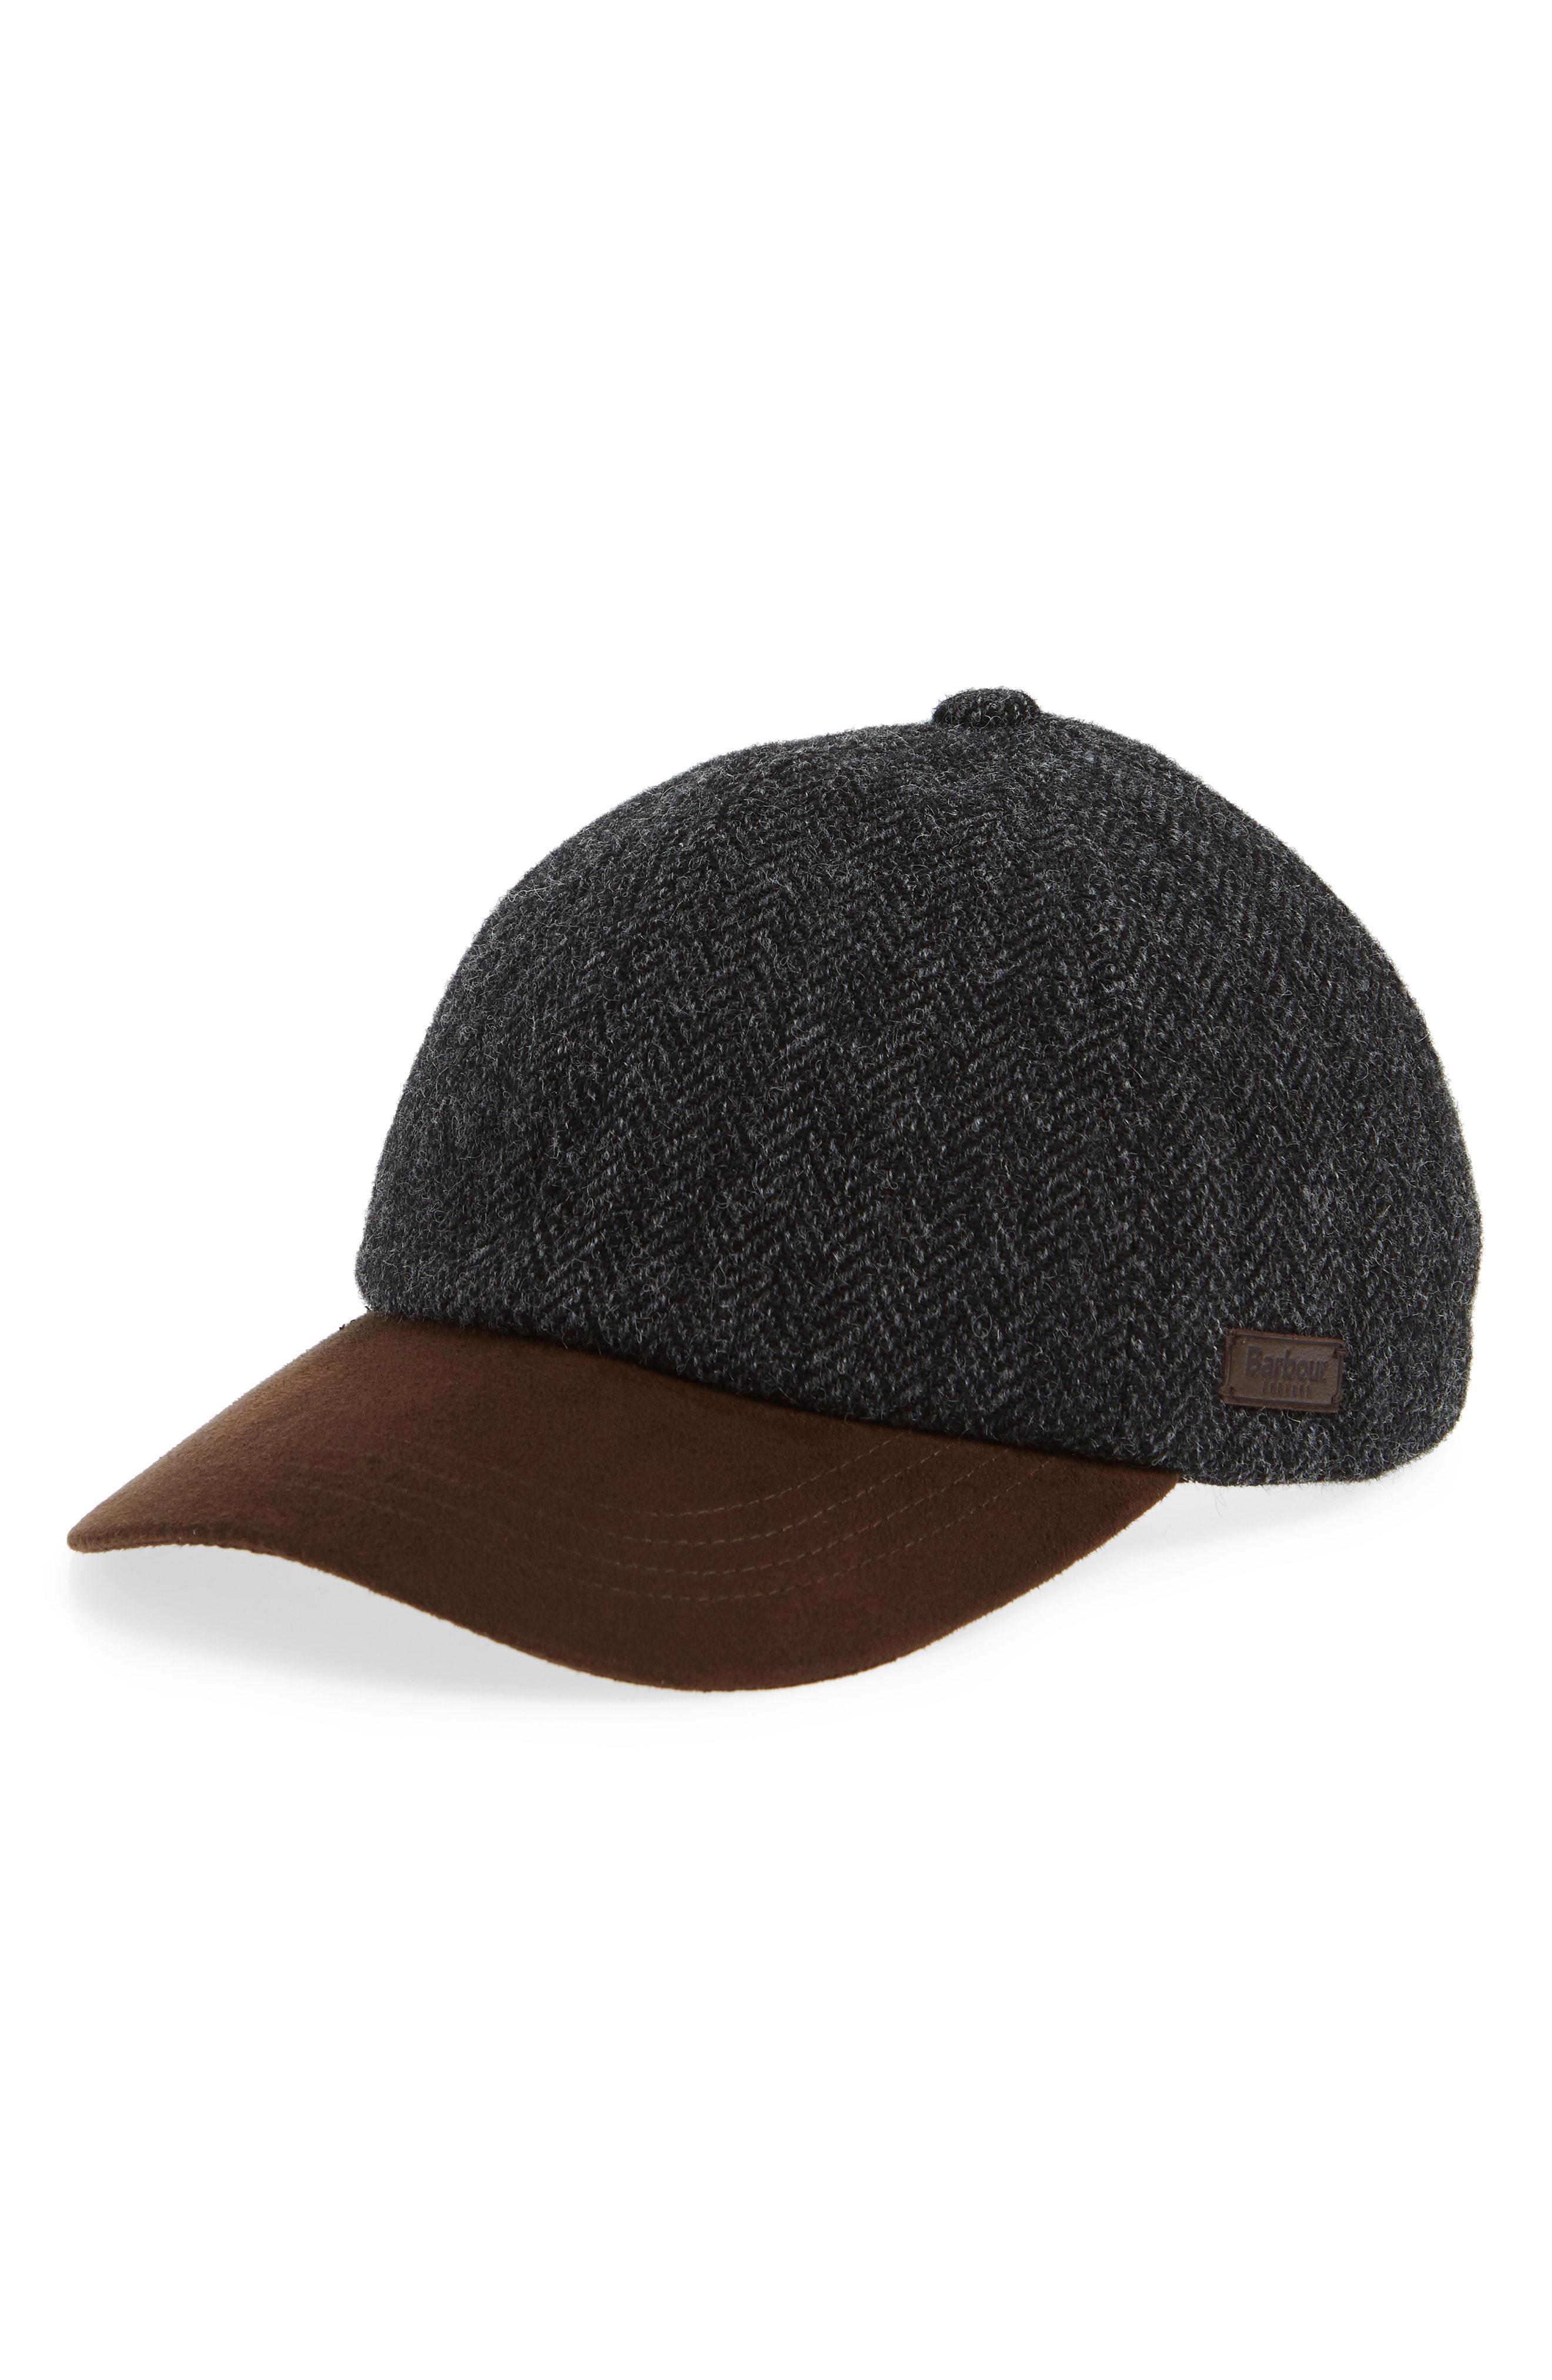 Lyst - Barbour Dotterel Wool   Moleskin Cap - in Black for Men 7155e4cd45ef